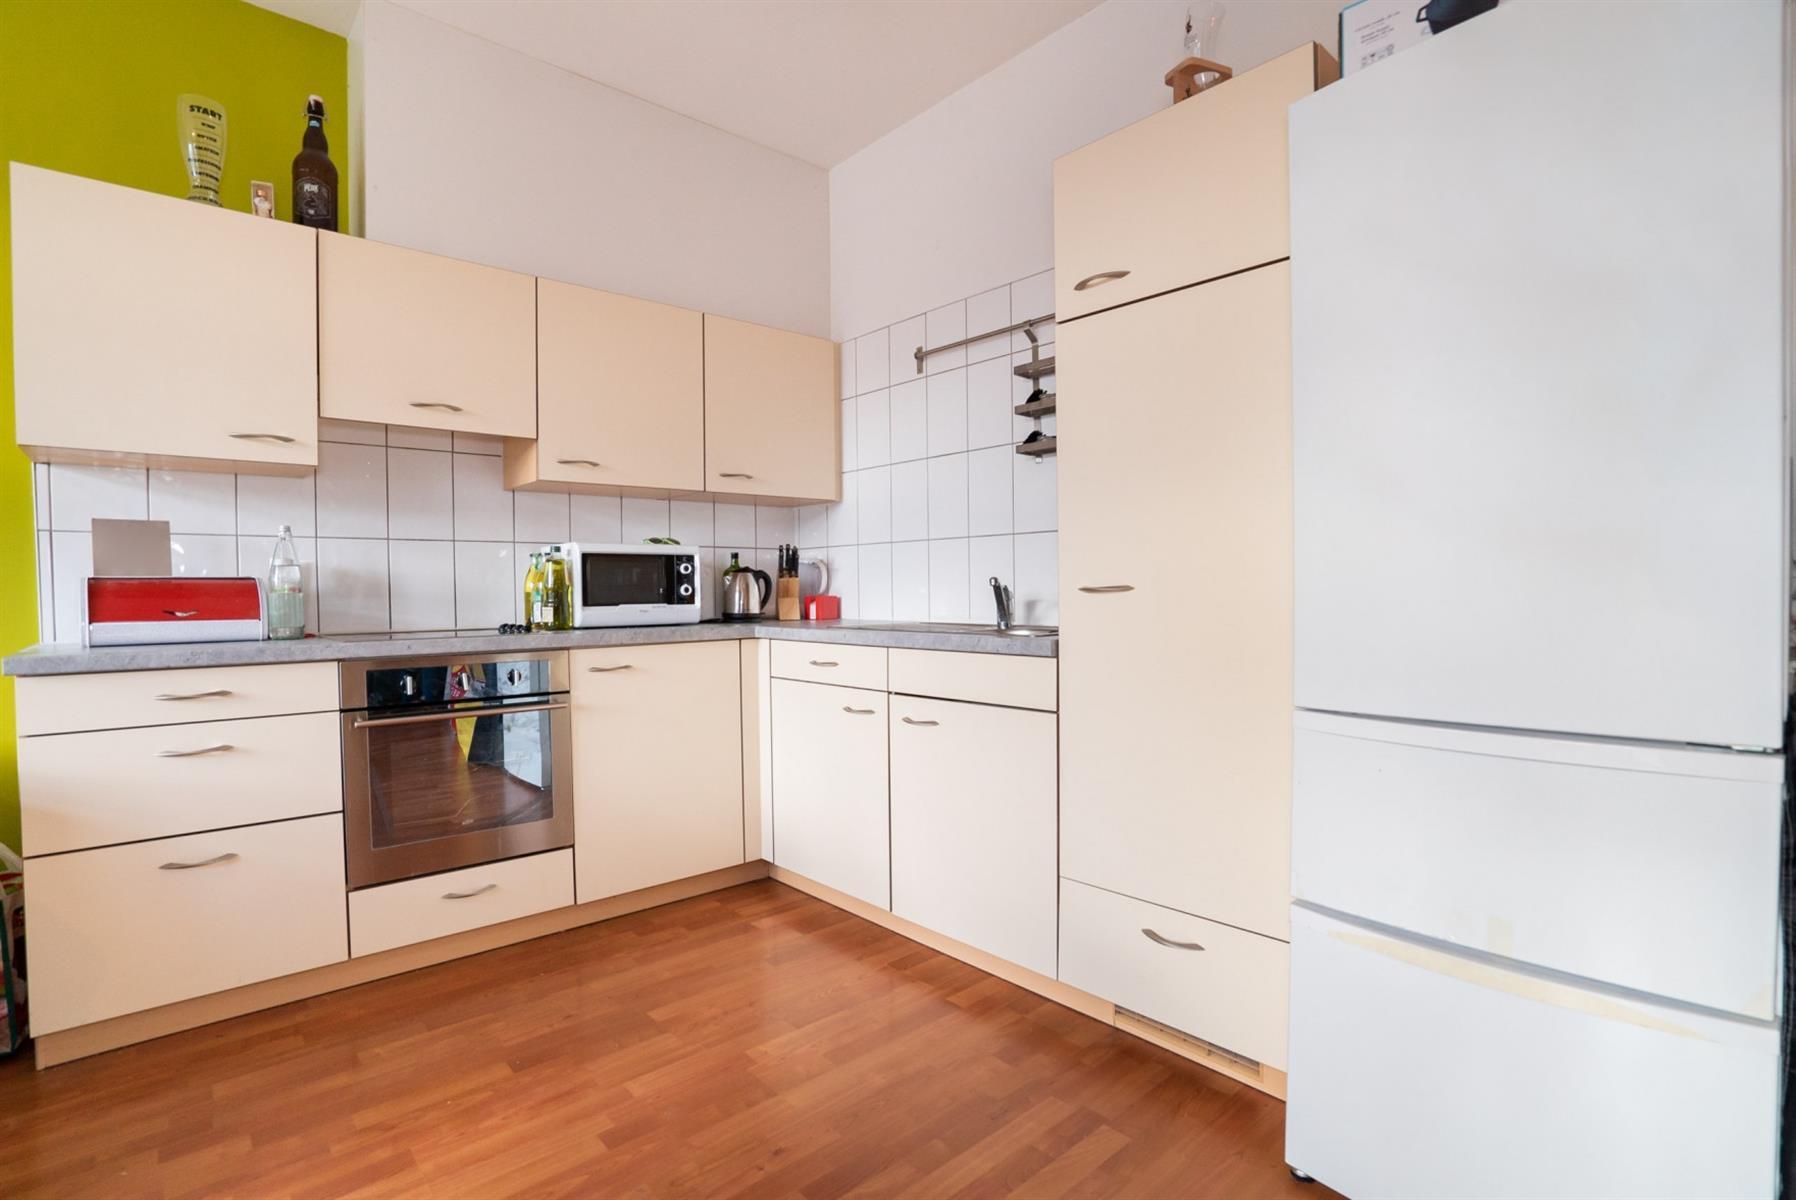 Appartement - Welkenraedt Henri-Chapelle - #4270873-2